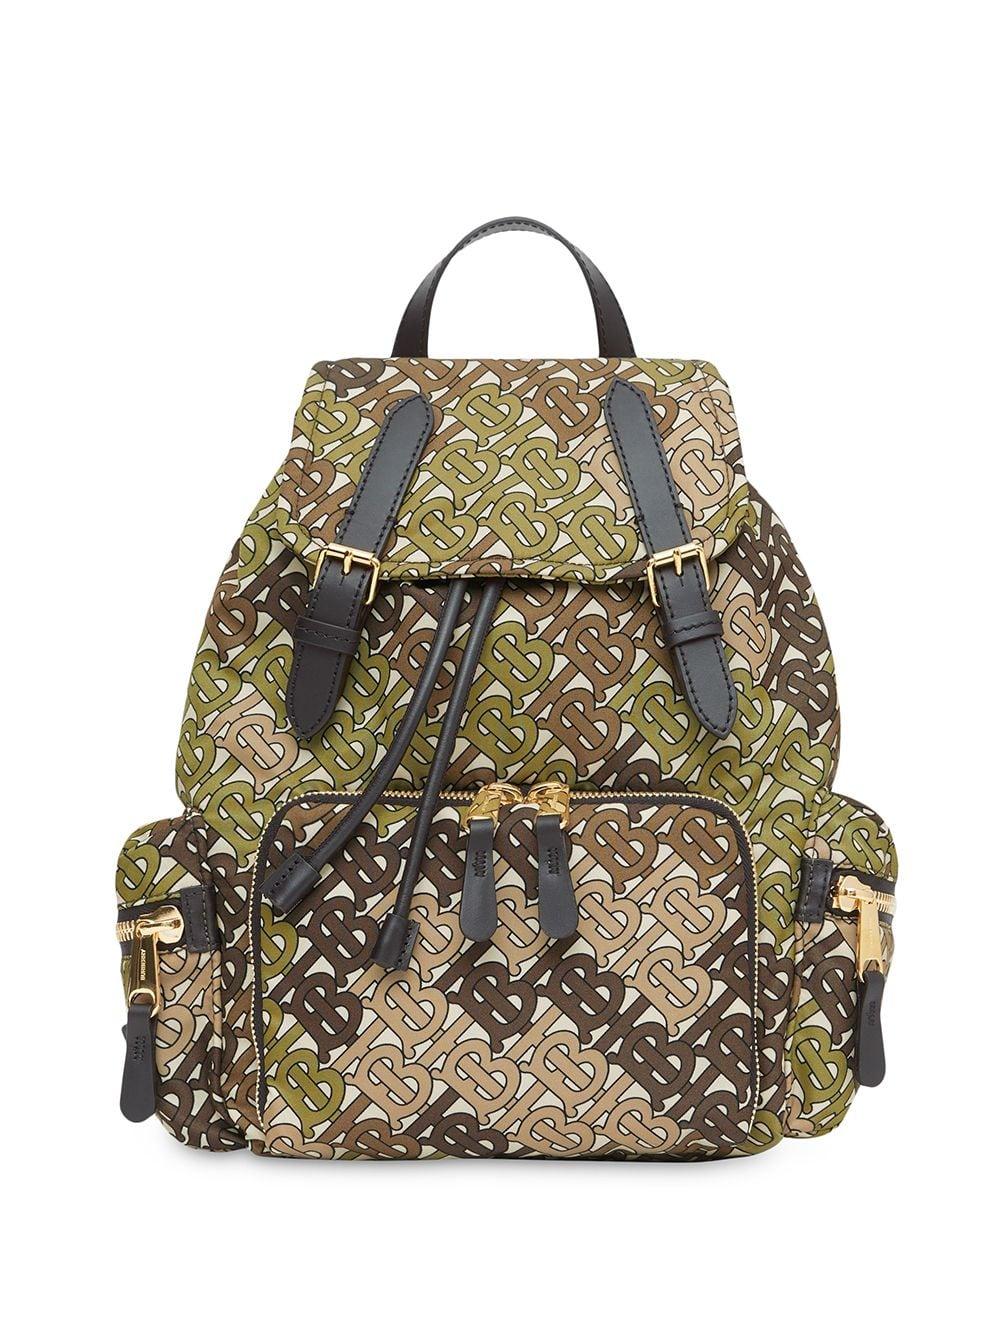 79fbd9f731d Medium The Rucksack Backpack With Monogram Print - BURBERRY - Russocapri